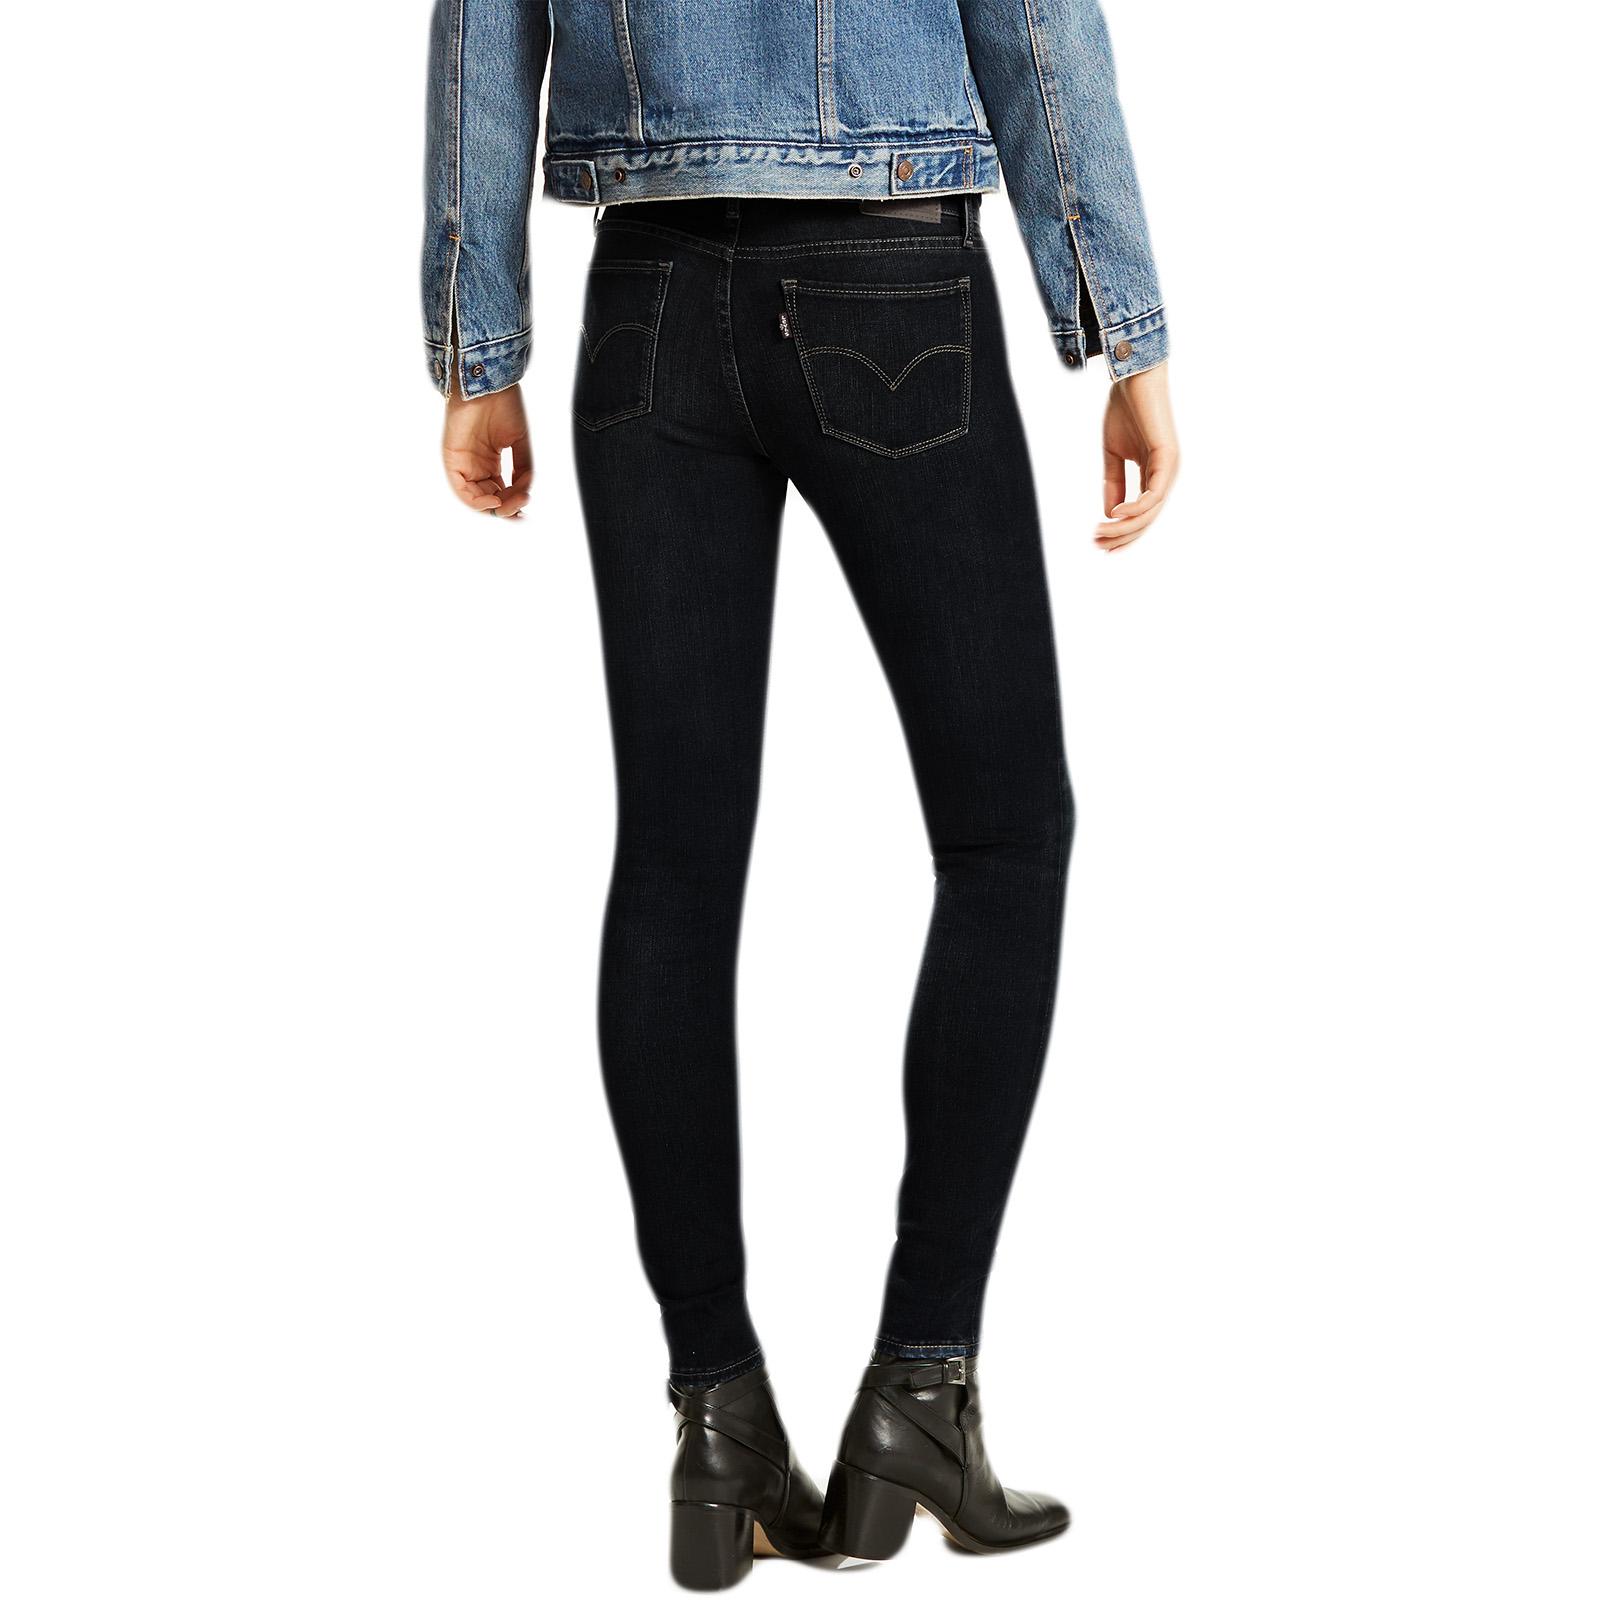 Super Femme Skinny Jeans Levi Strauss Noir 710 OXFtqxSnZ